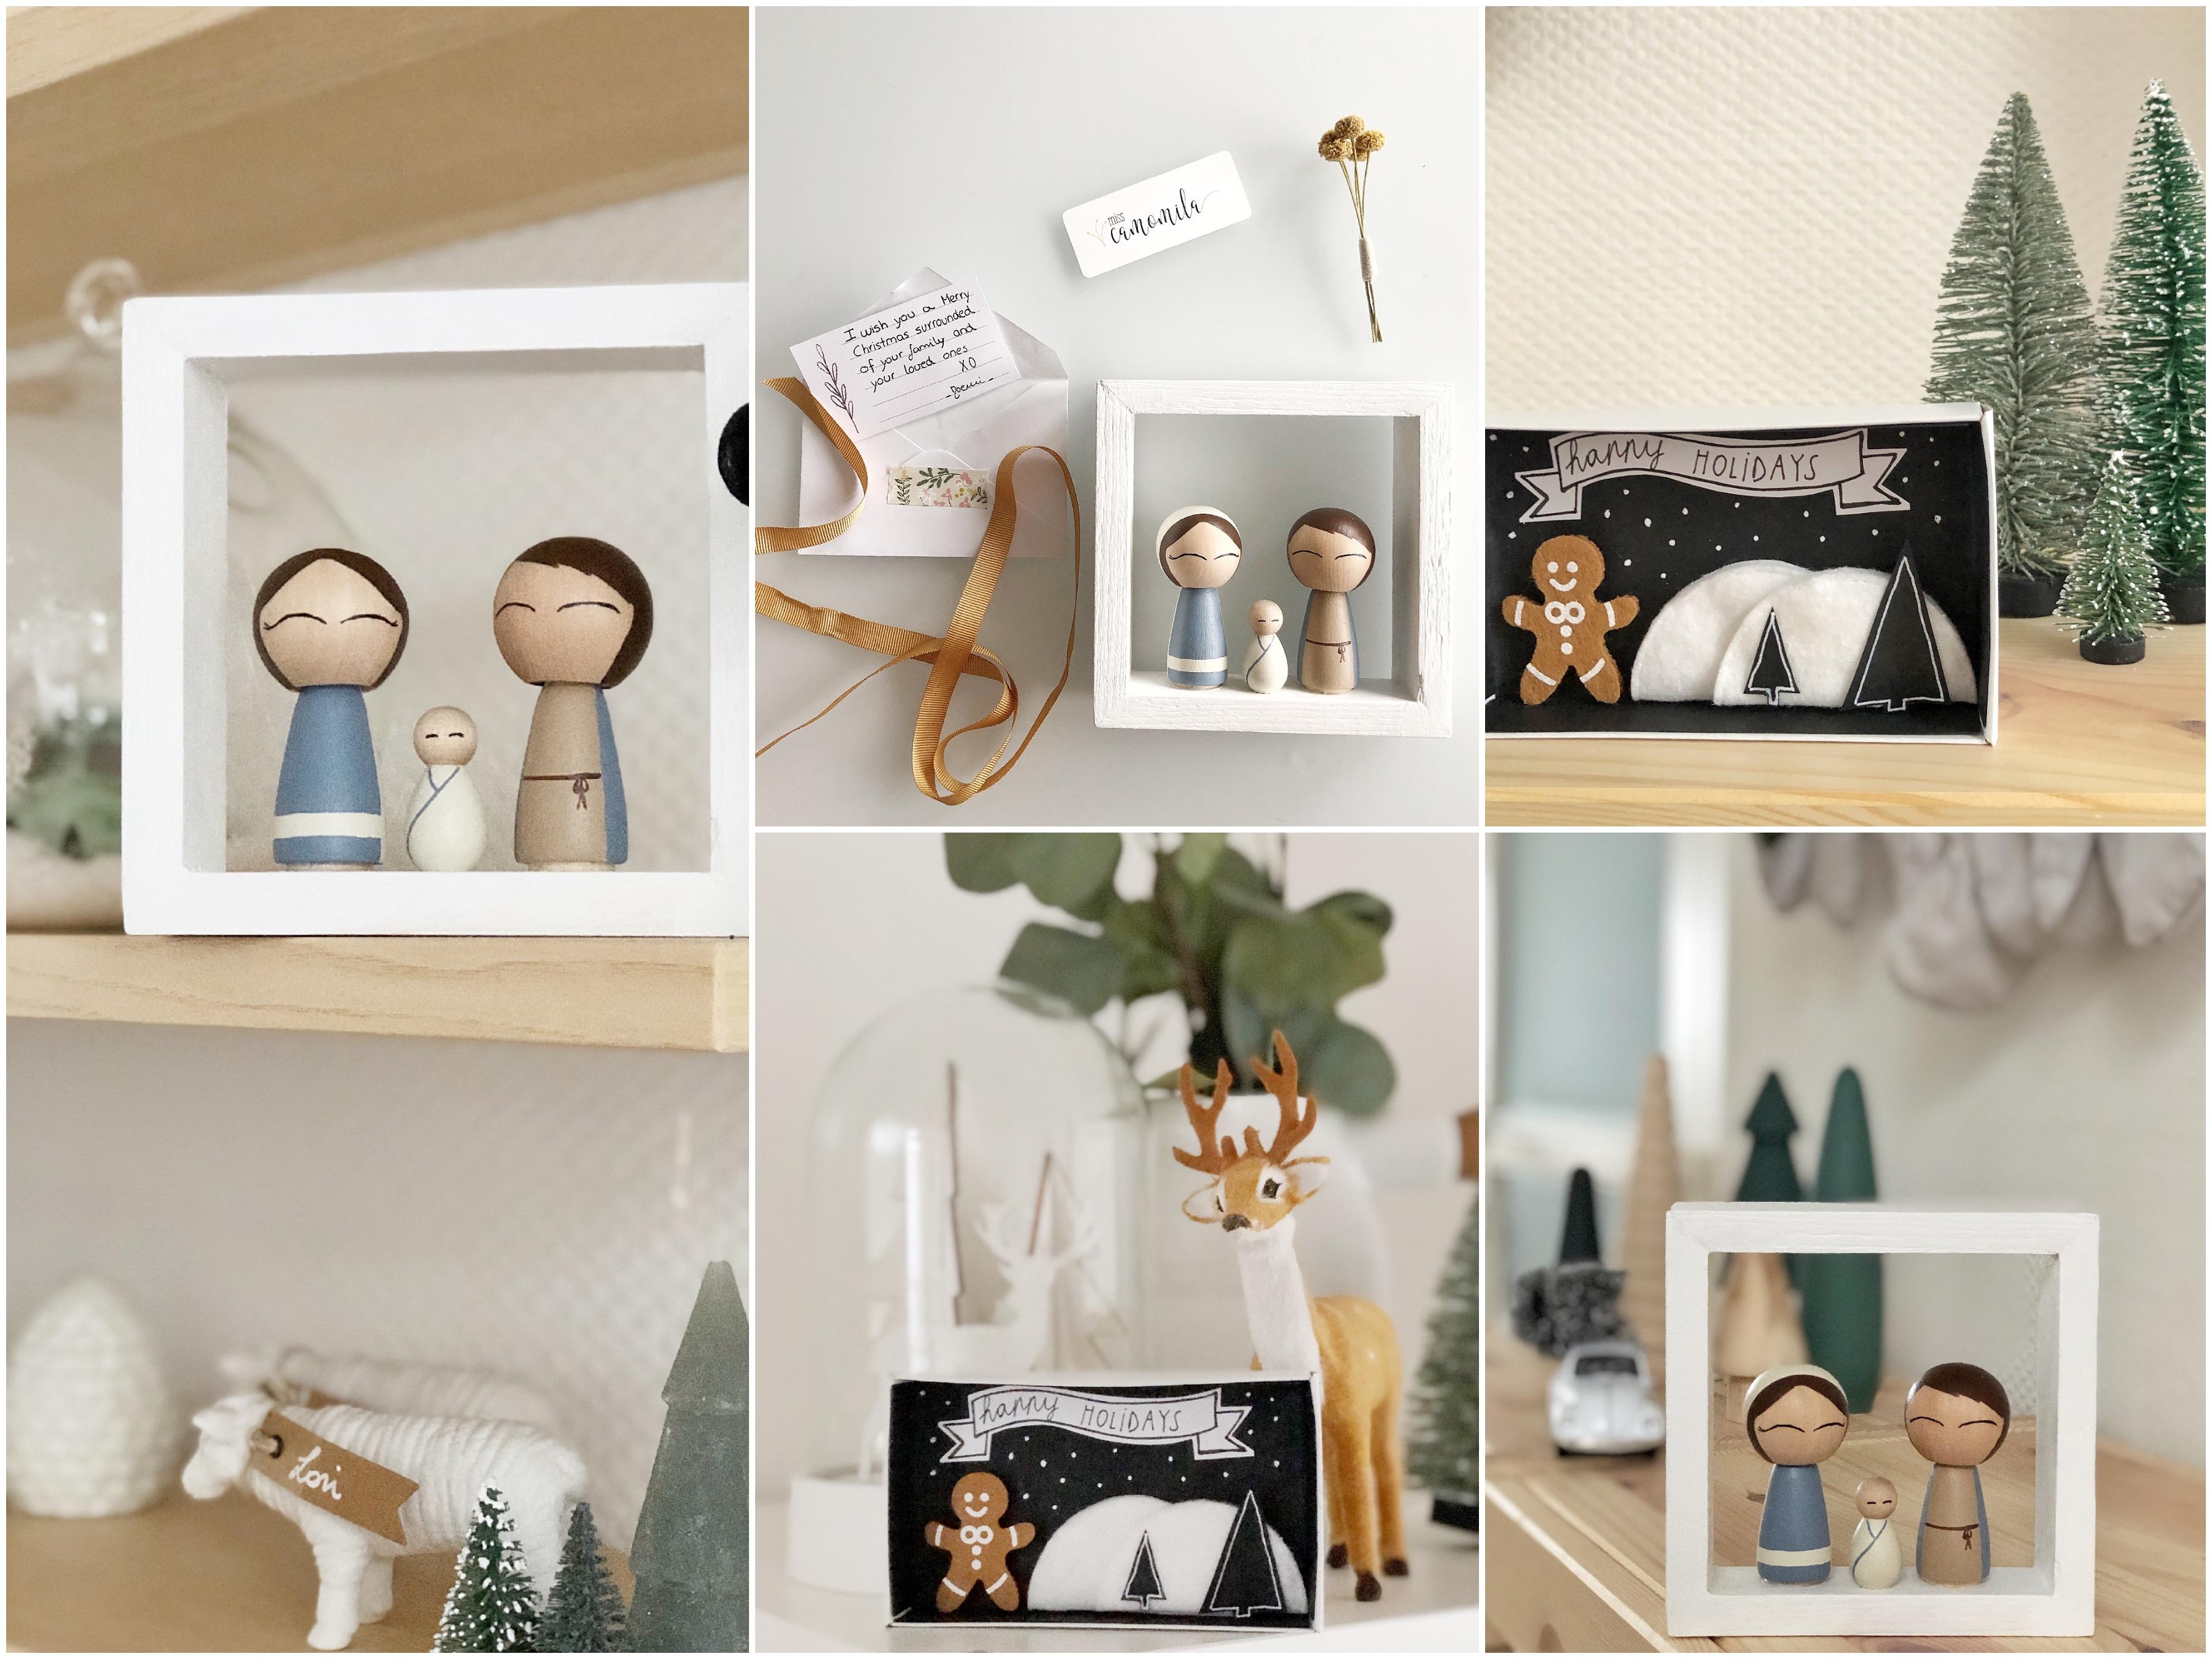 kerstmis, christmas, interieur, pegdolls, kerststal, nativity scene, DIY matchbox, christmas matchbox